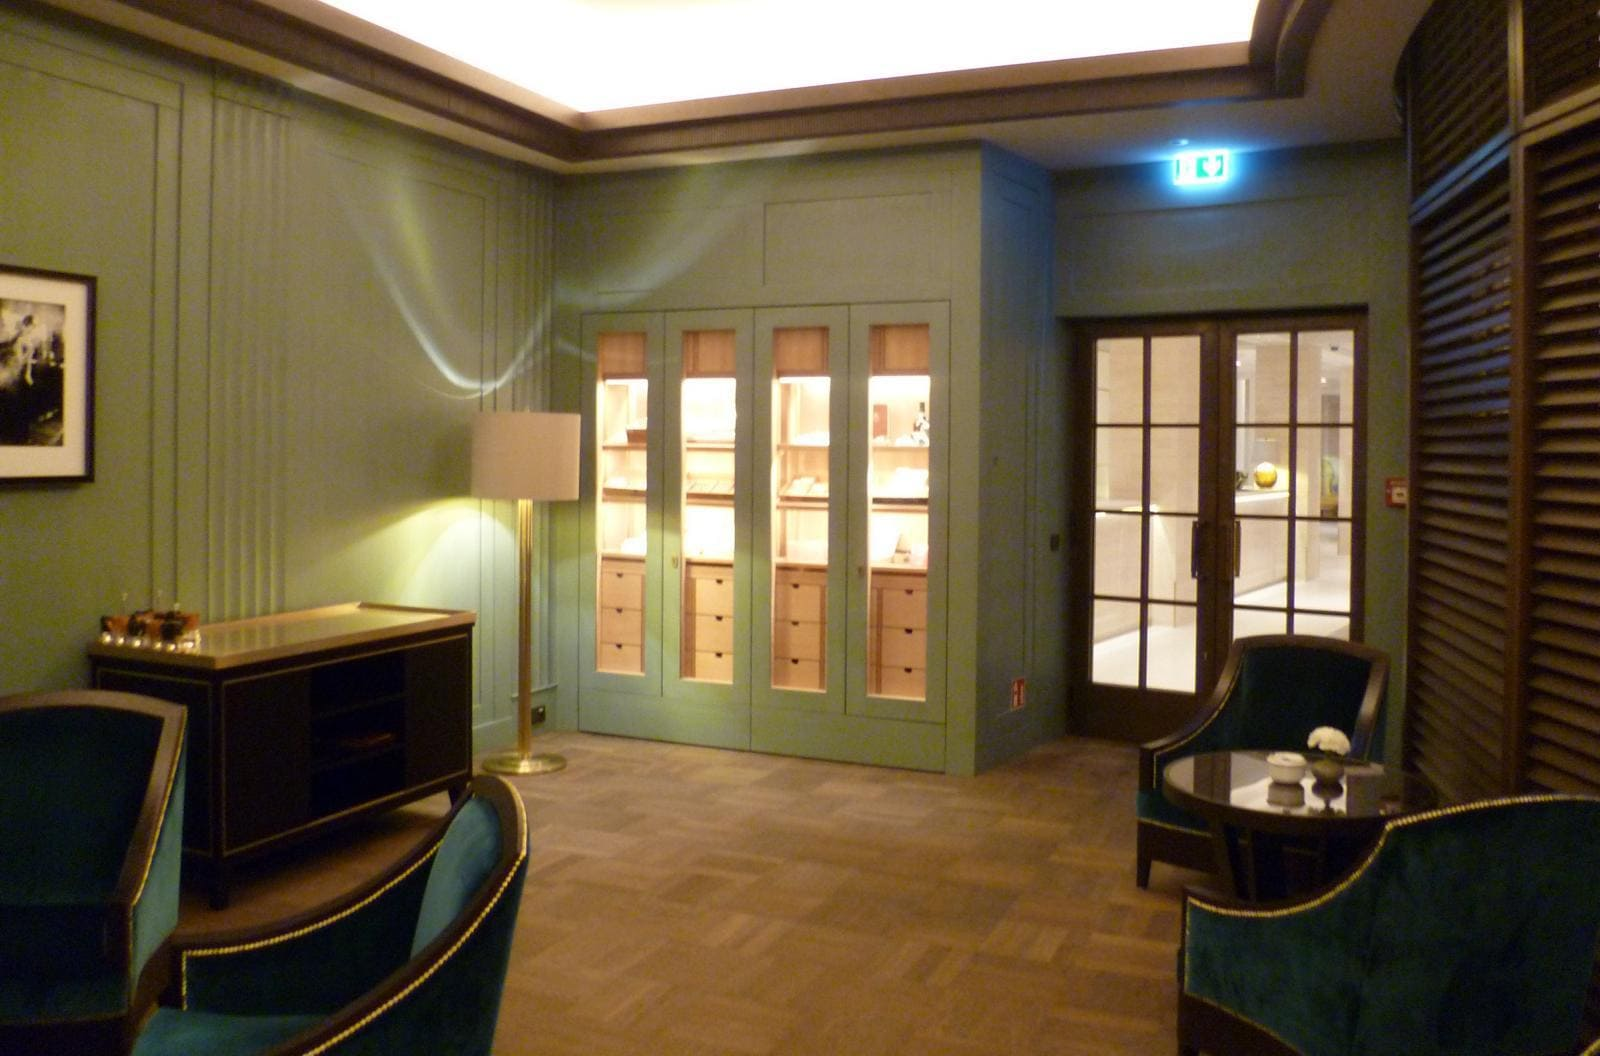 Hotel Adlon Kempinski Neue Cigarlounge Mit Original